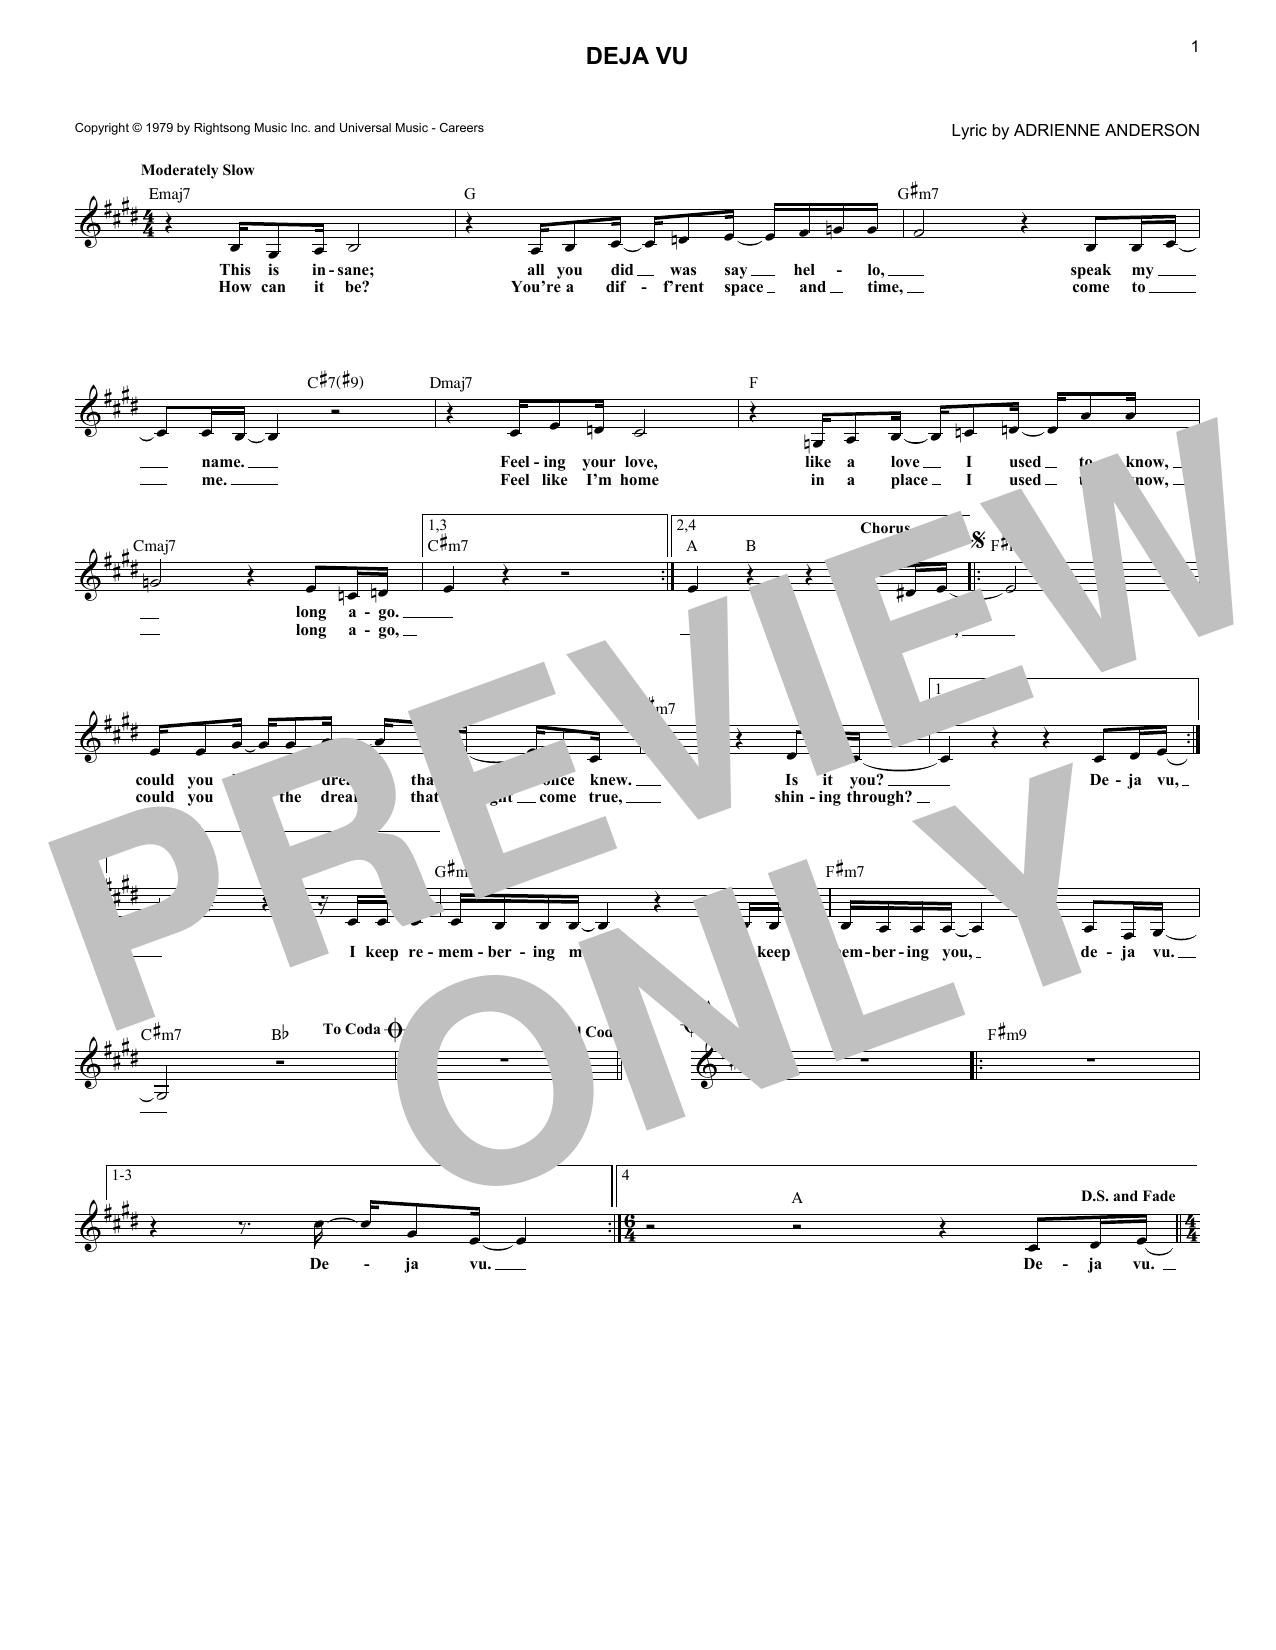 dionne warwick deja vu sheet music notes and chords for melody line lyrics chords